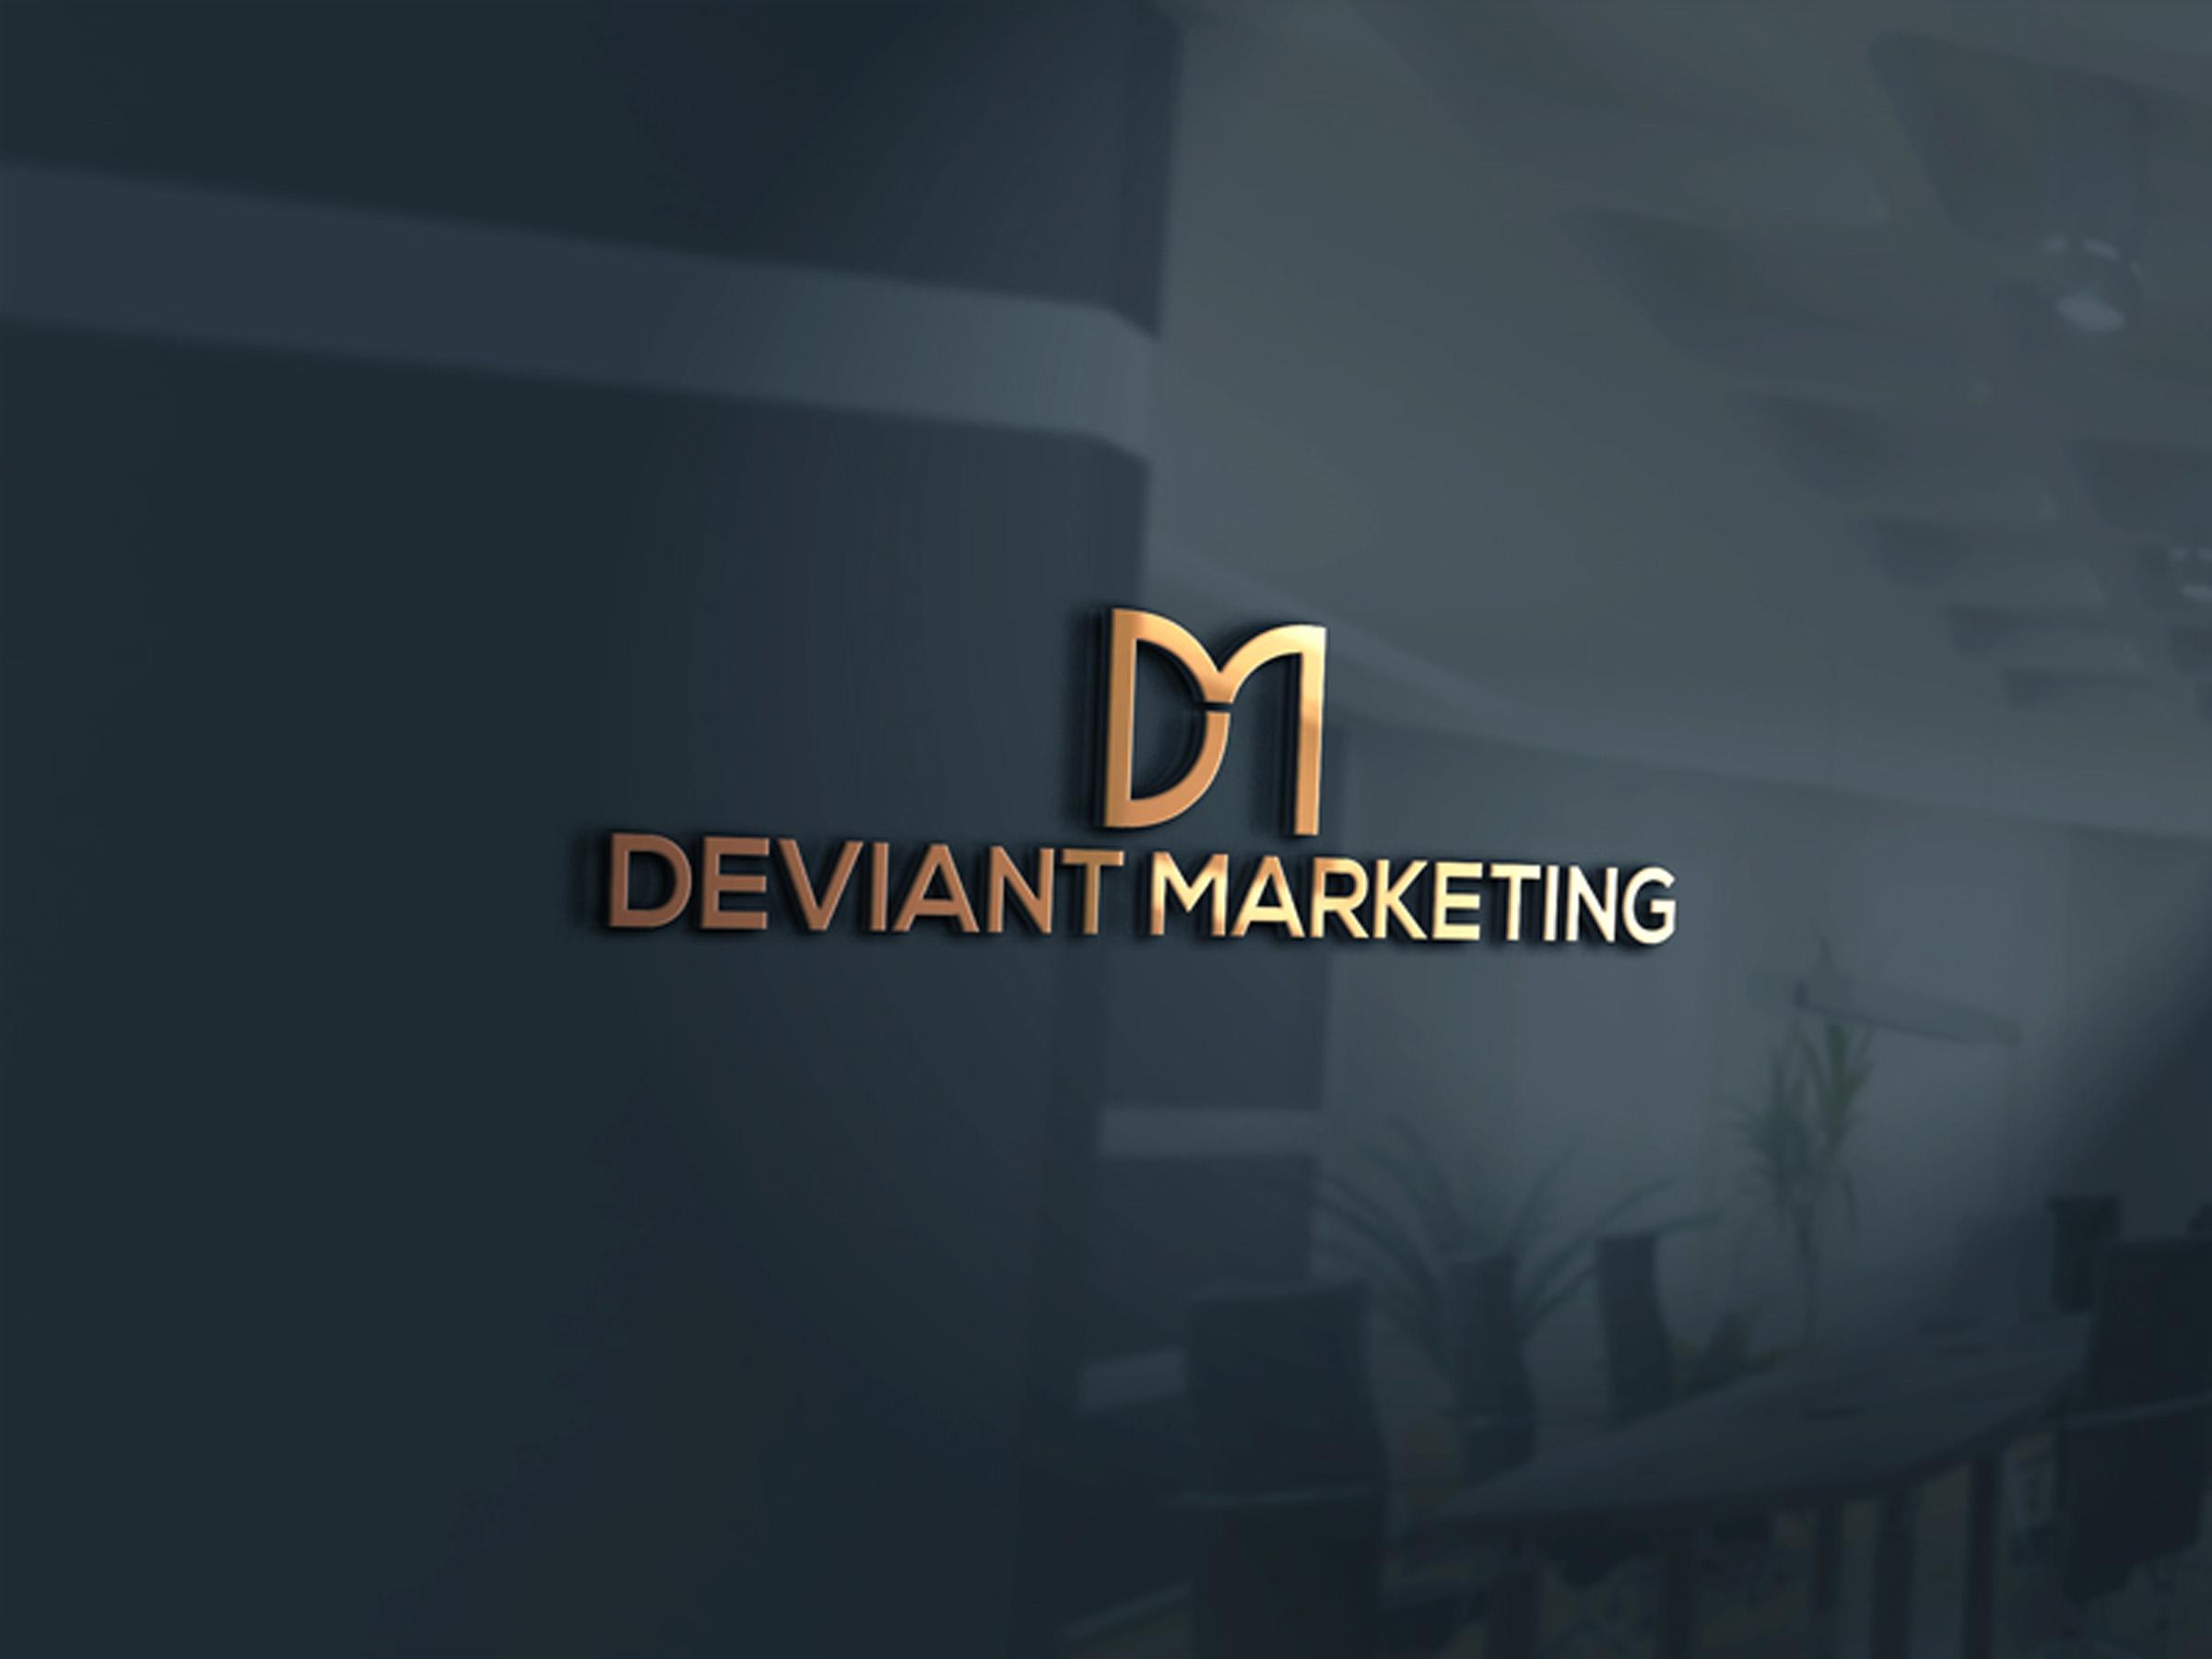 Deviant Marketing